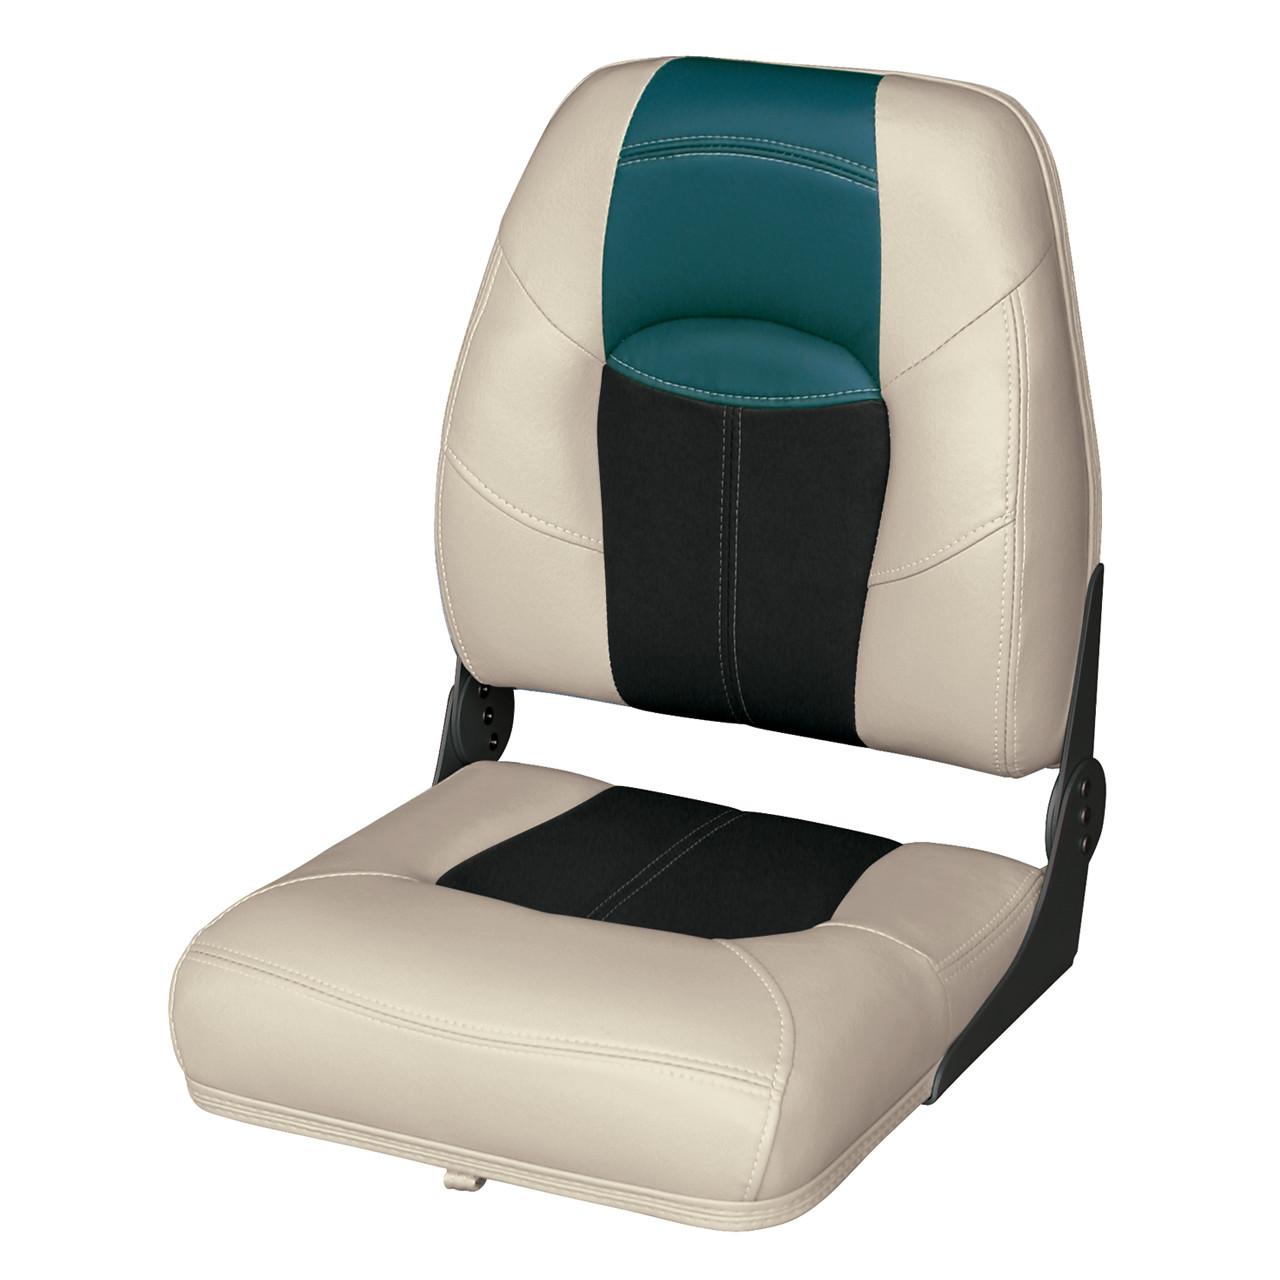 Wise Folding Bass Boat Seats High Back Wd1461 Free